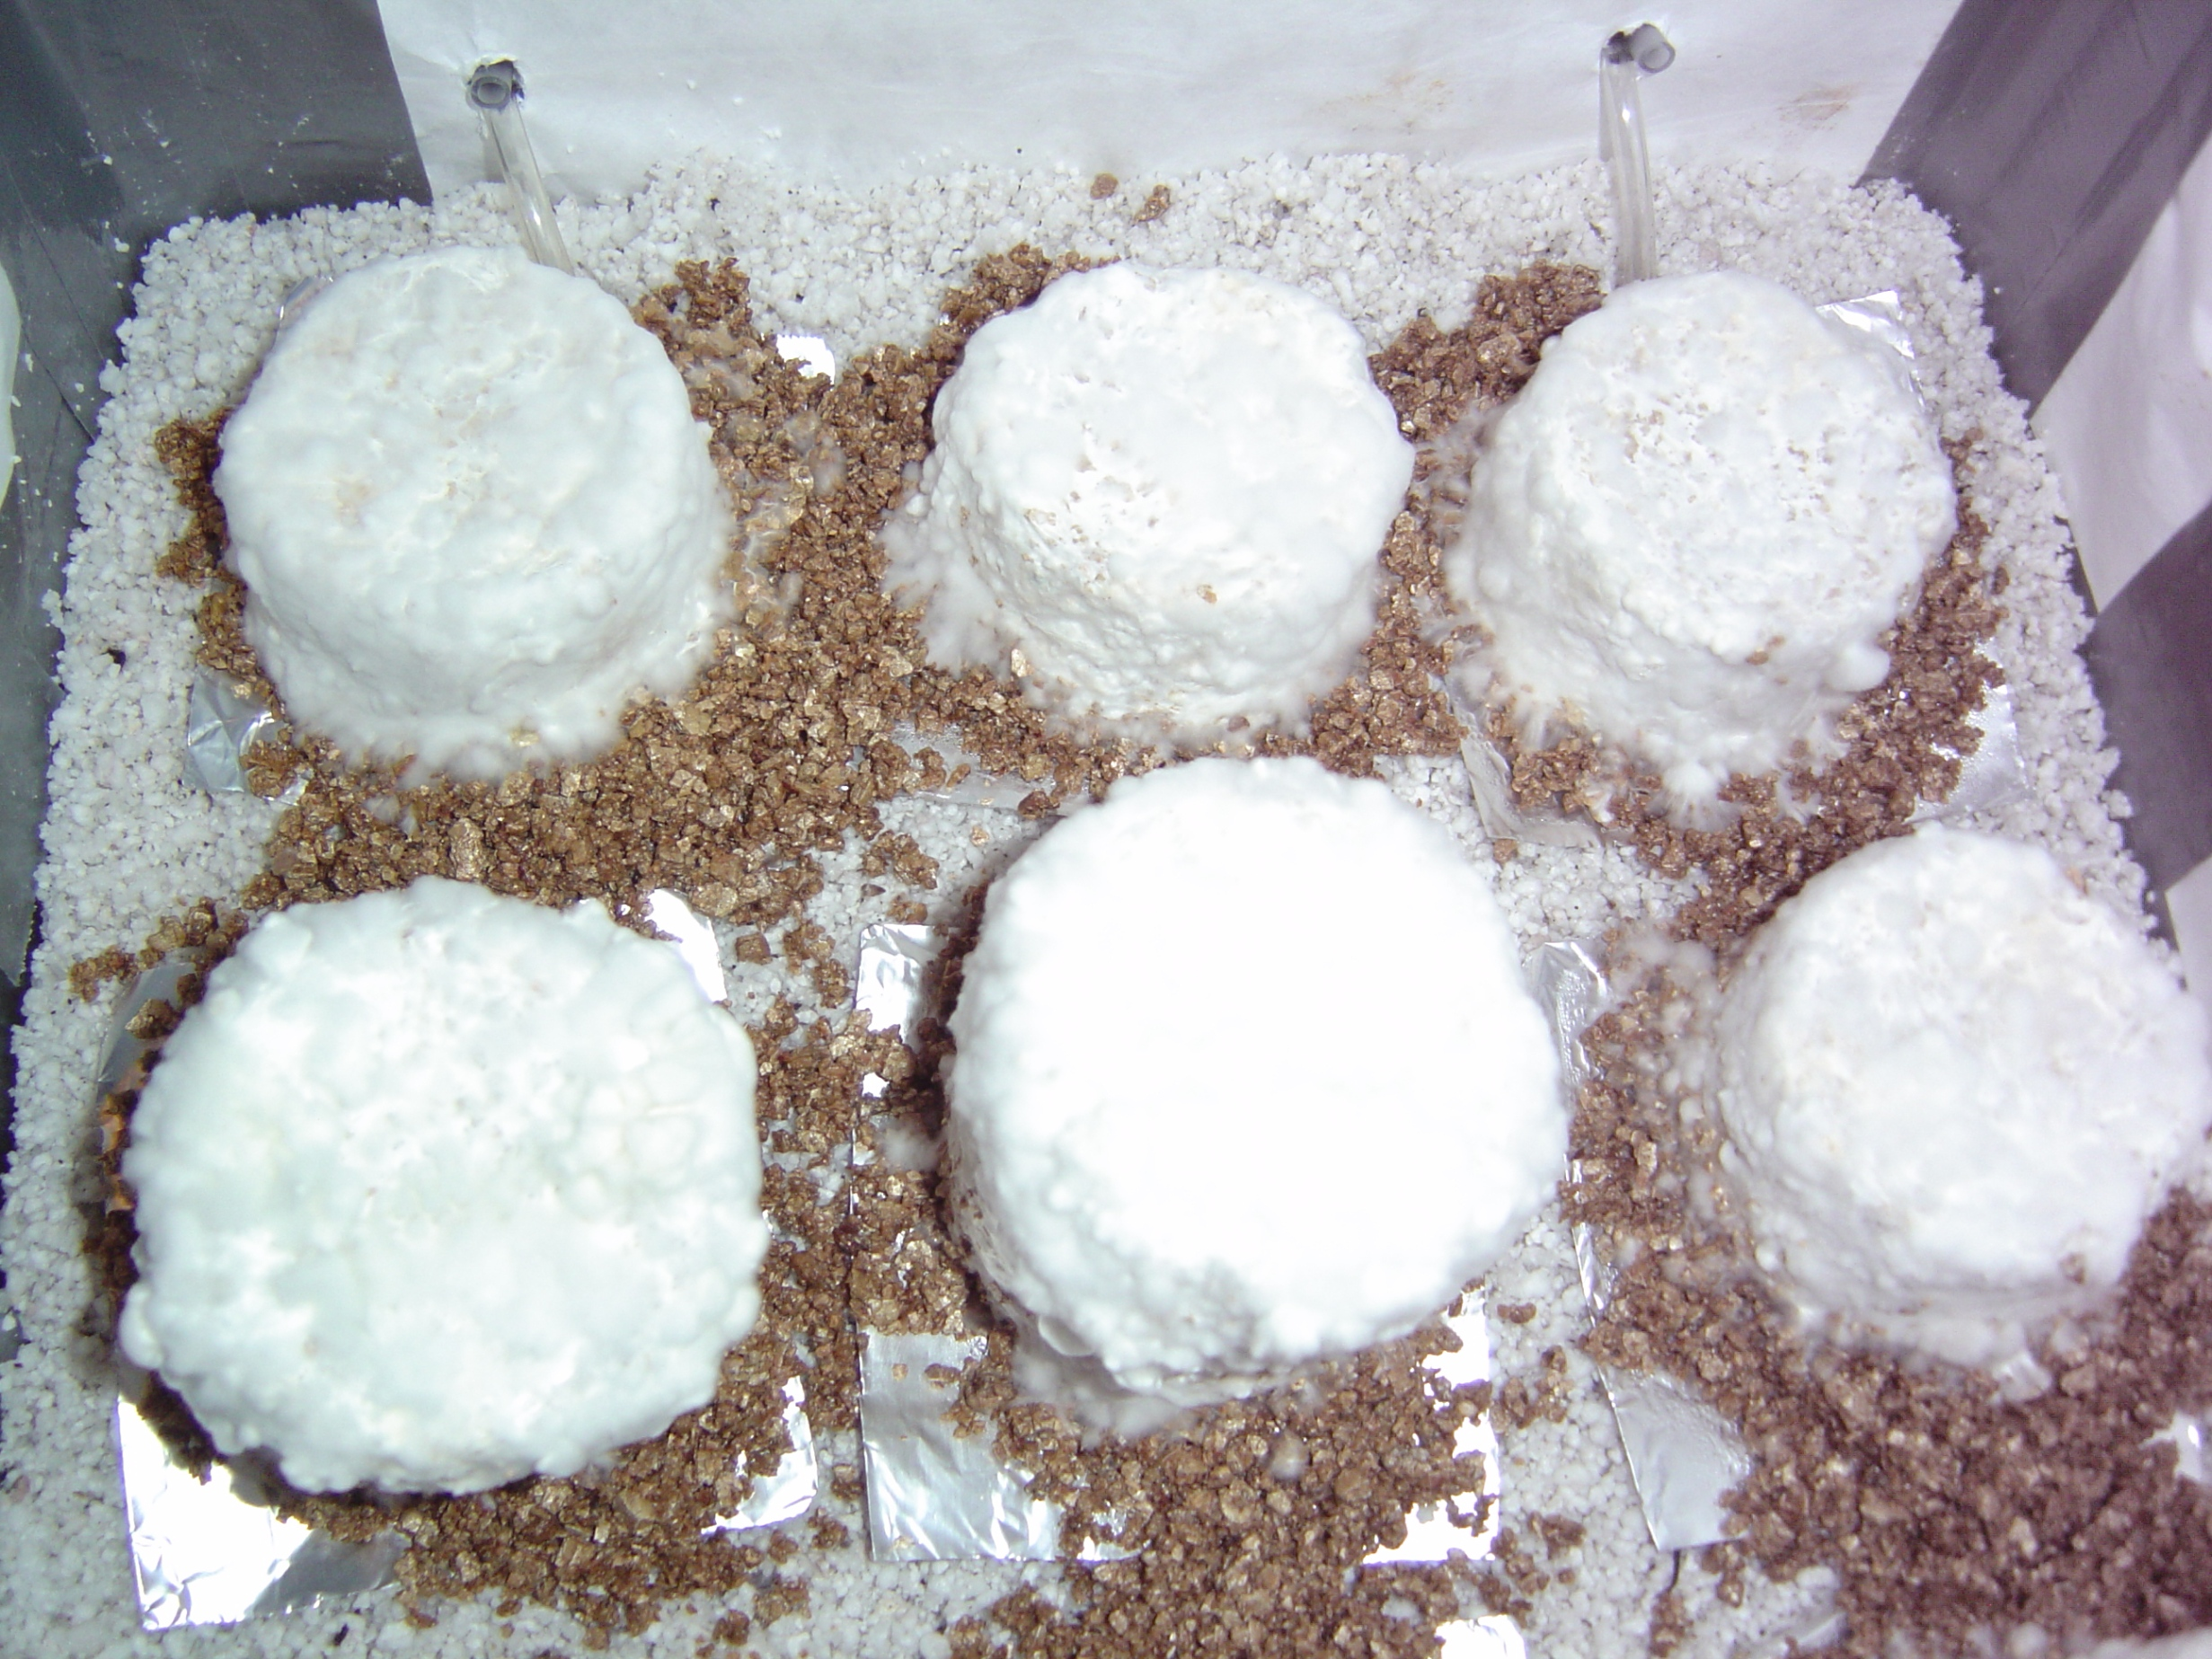 Very Fuzzy Cakes? - Fungi: Magic Mushrooms - Mycotopia